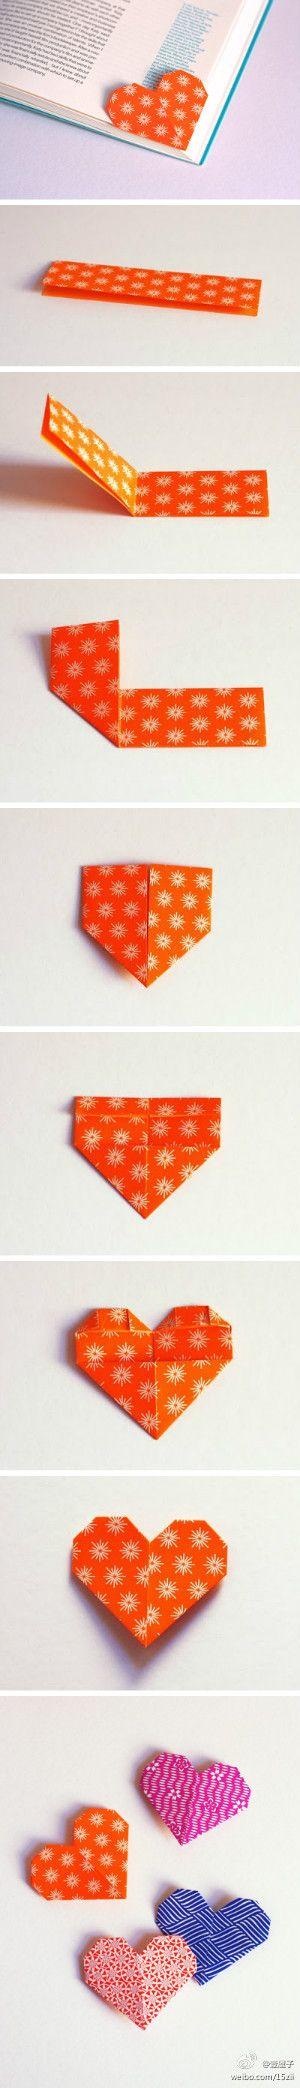 DIY心形折纸书签手工教程 - 堆糖 发现生活_收集美好_分享图片